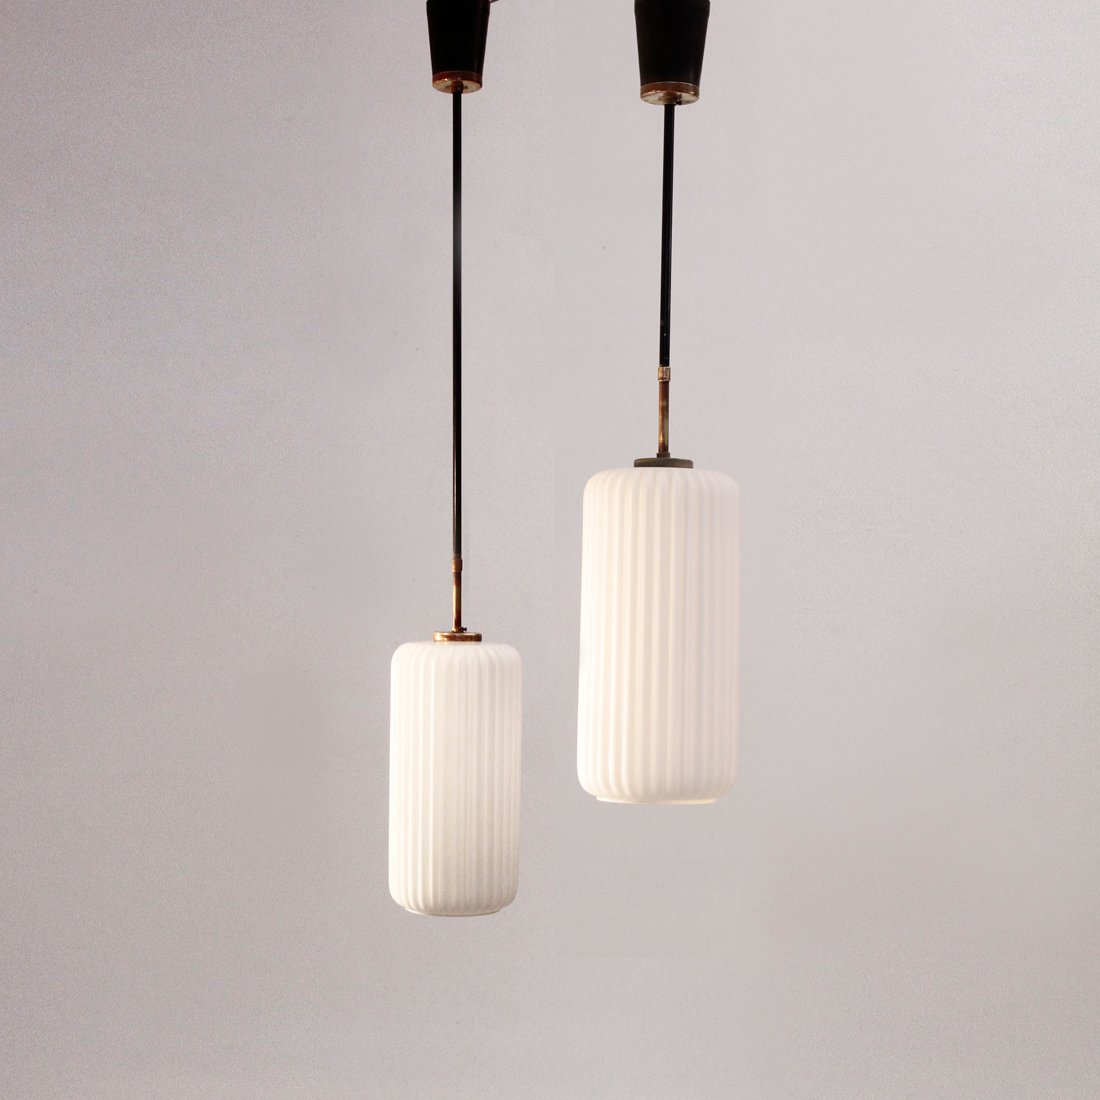 italian pendant lighting. Vintage Italian Pendant Lamps With Opaline Glass, 1950s, Set Of 2 For Sale At Pamono Lighting R